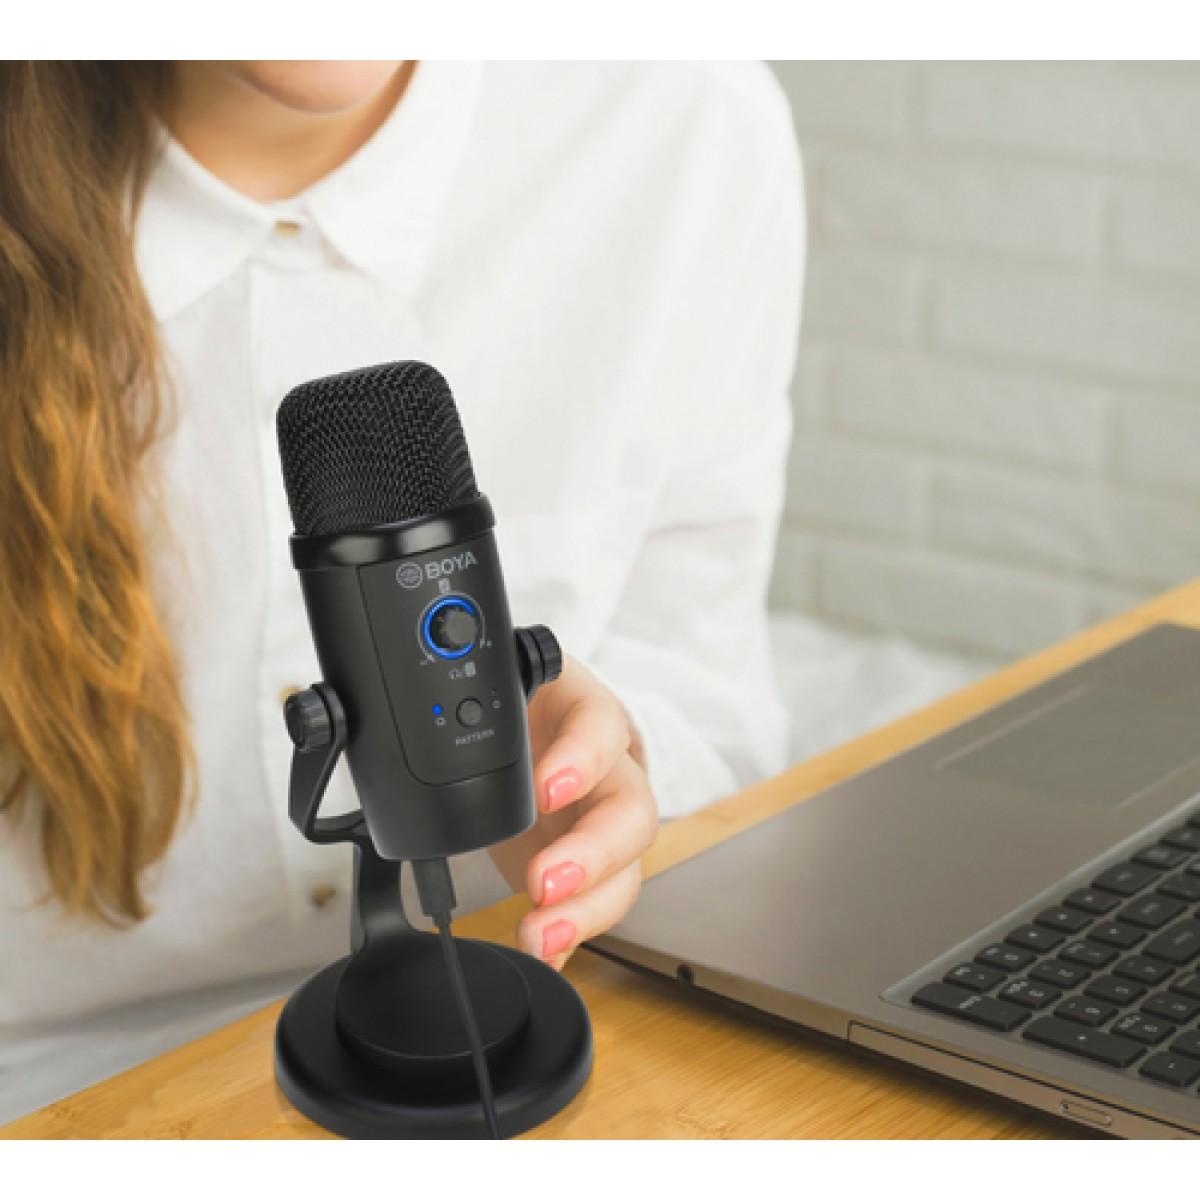 Microfone BOYA BY-PM500, USB, Com Suporte, Black